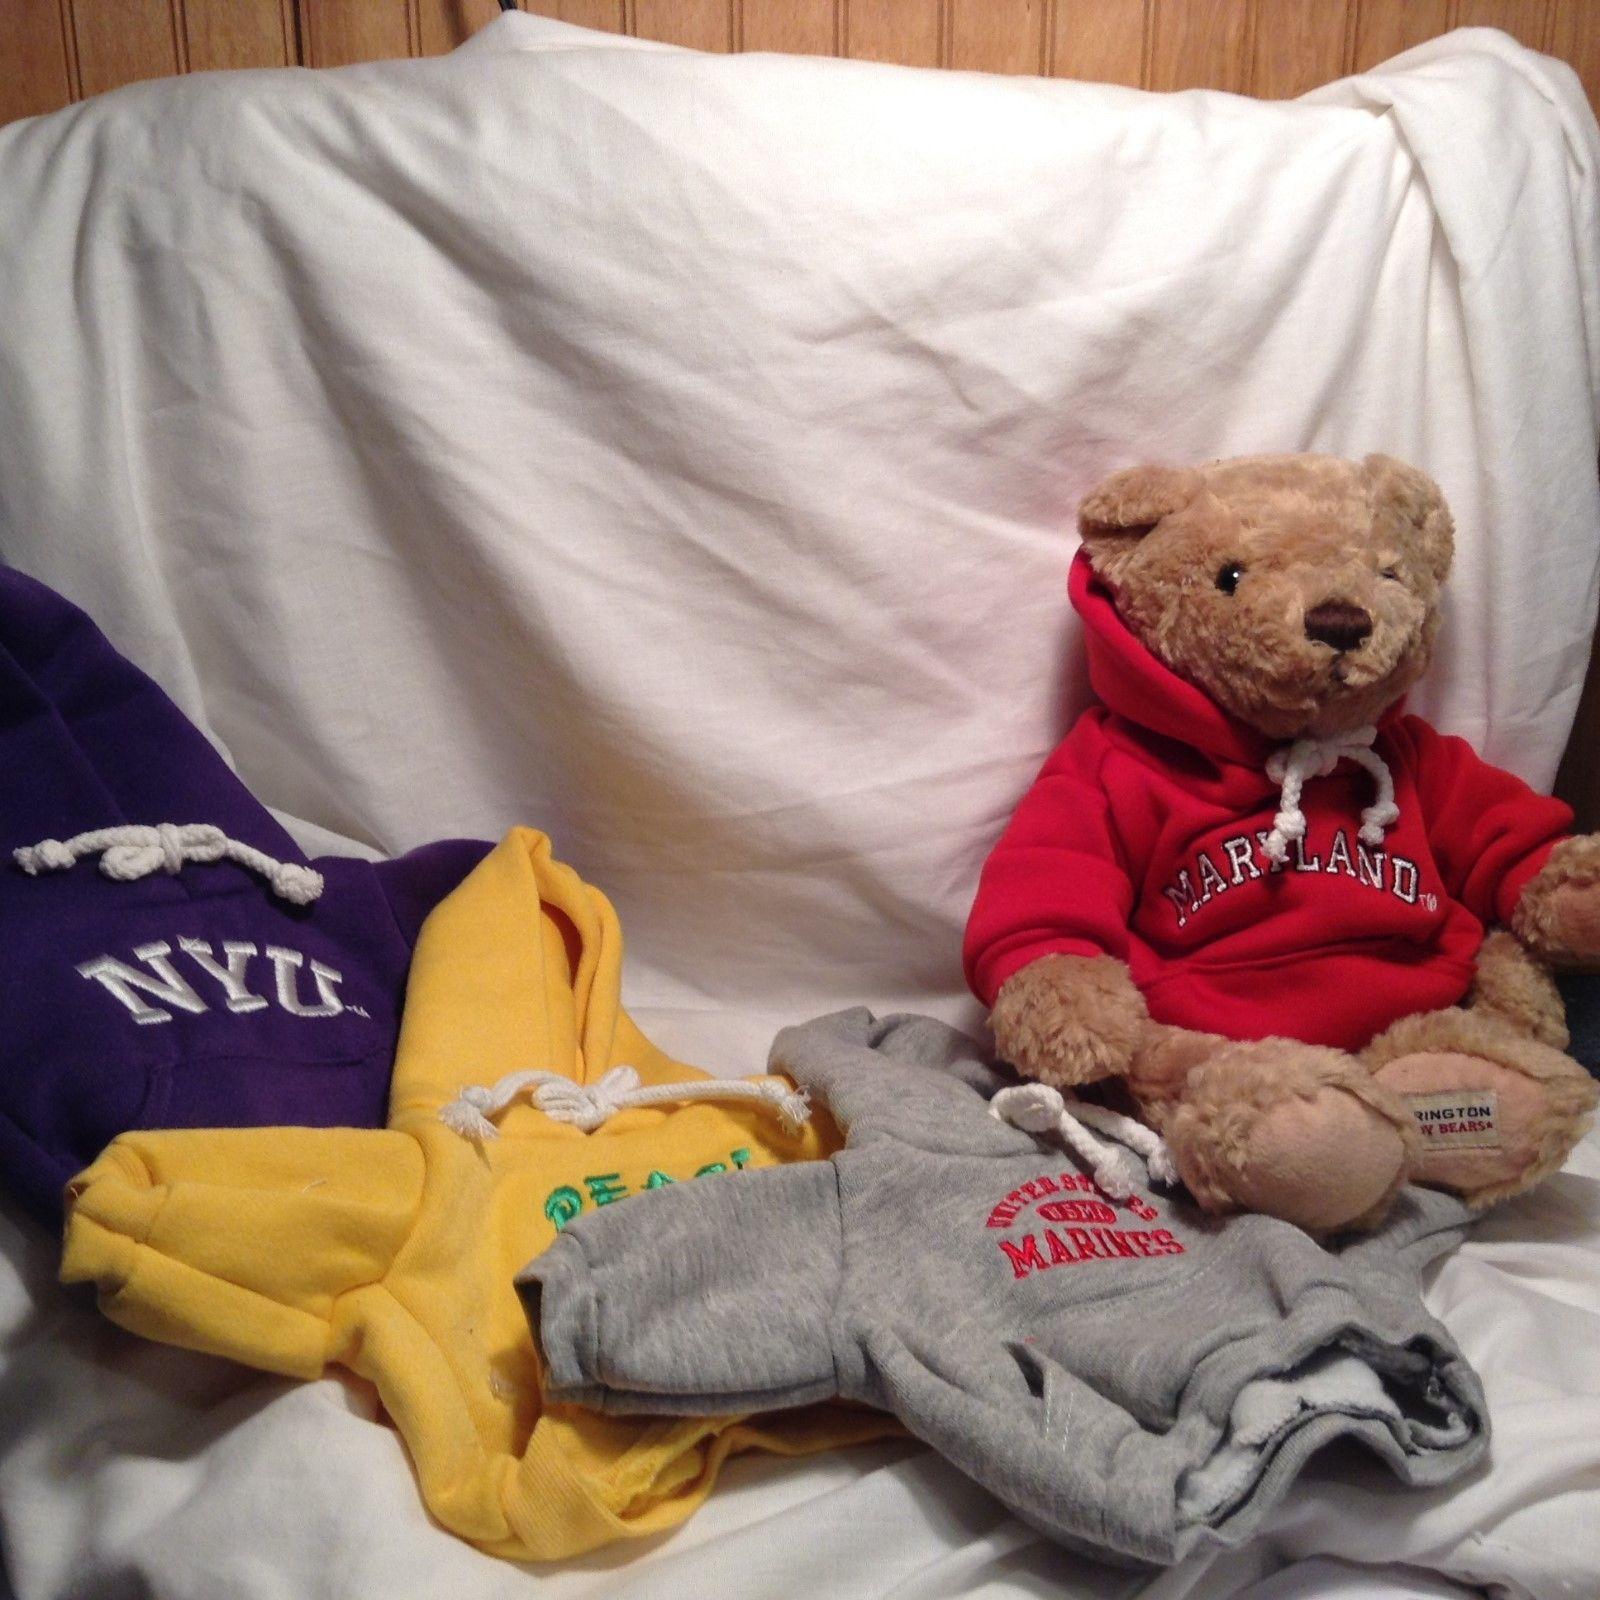 NEW Herrington Teddy Bear w 4 Hoodies